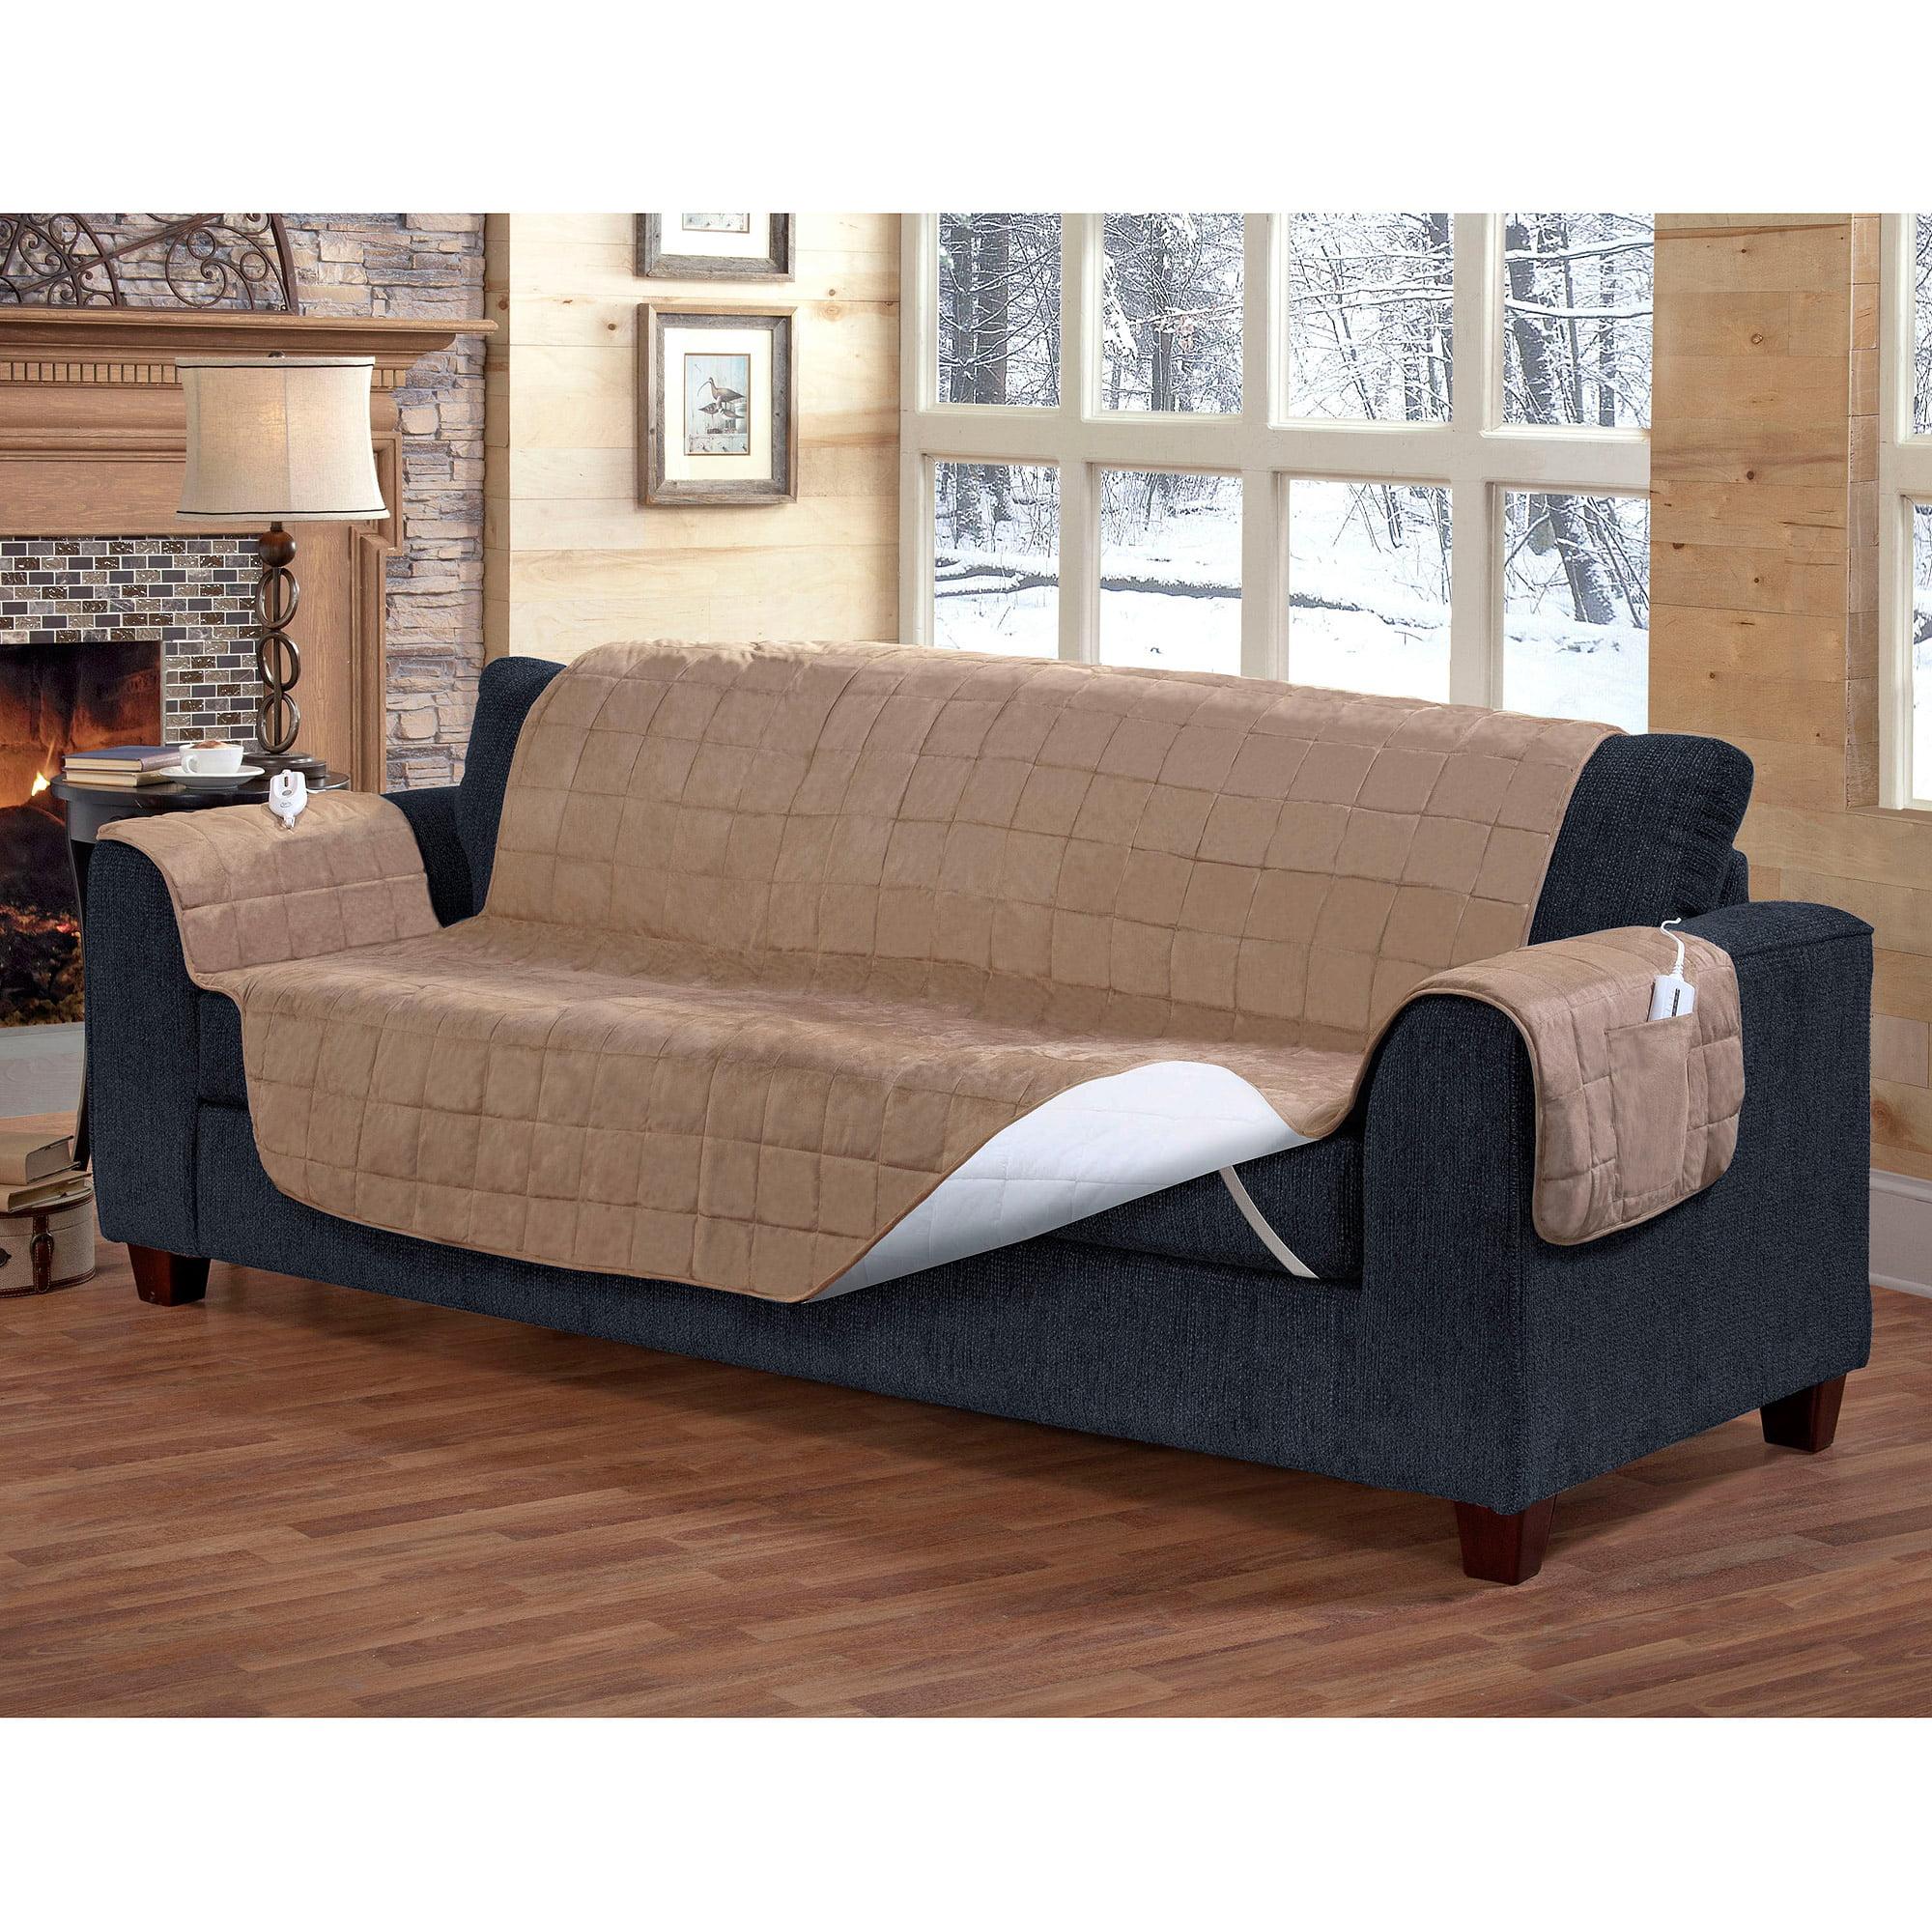 Serta Heated Sofa Protector   Walmart.com